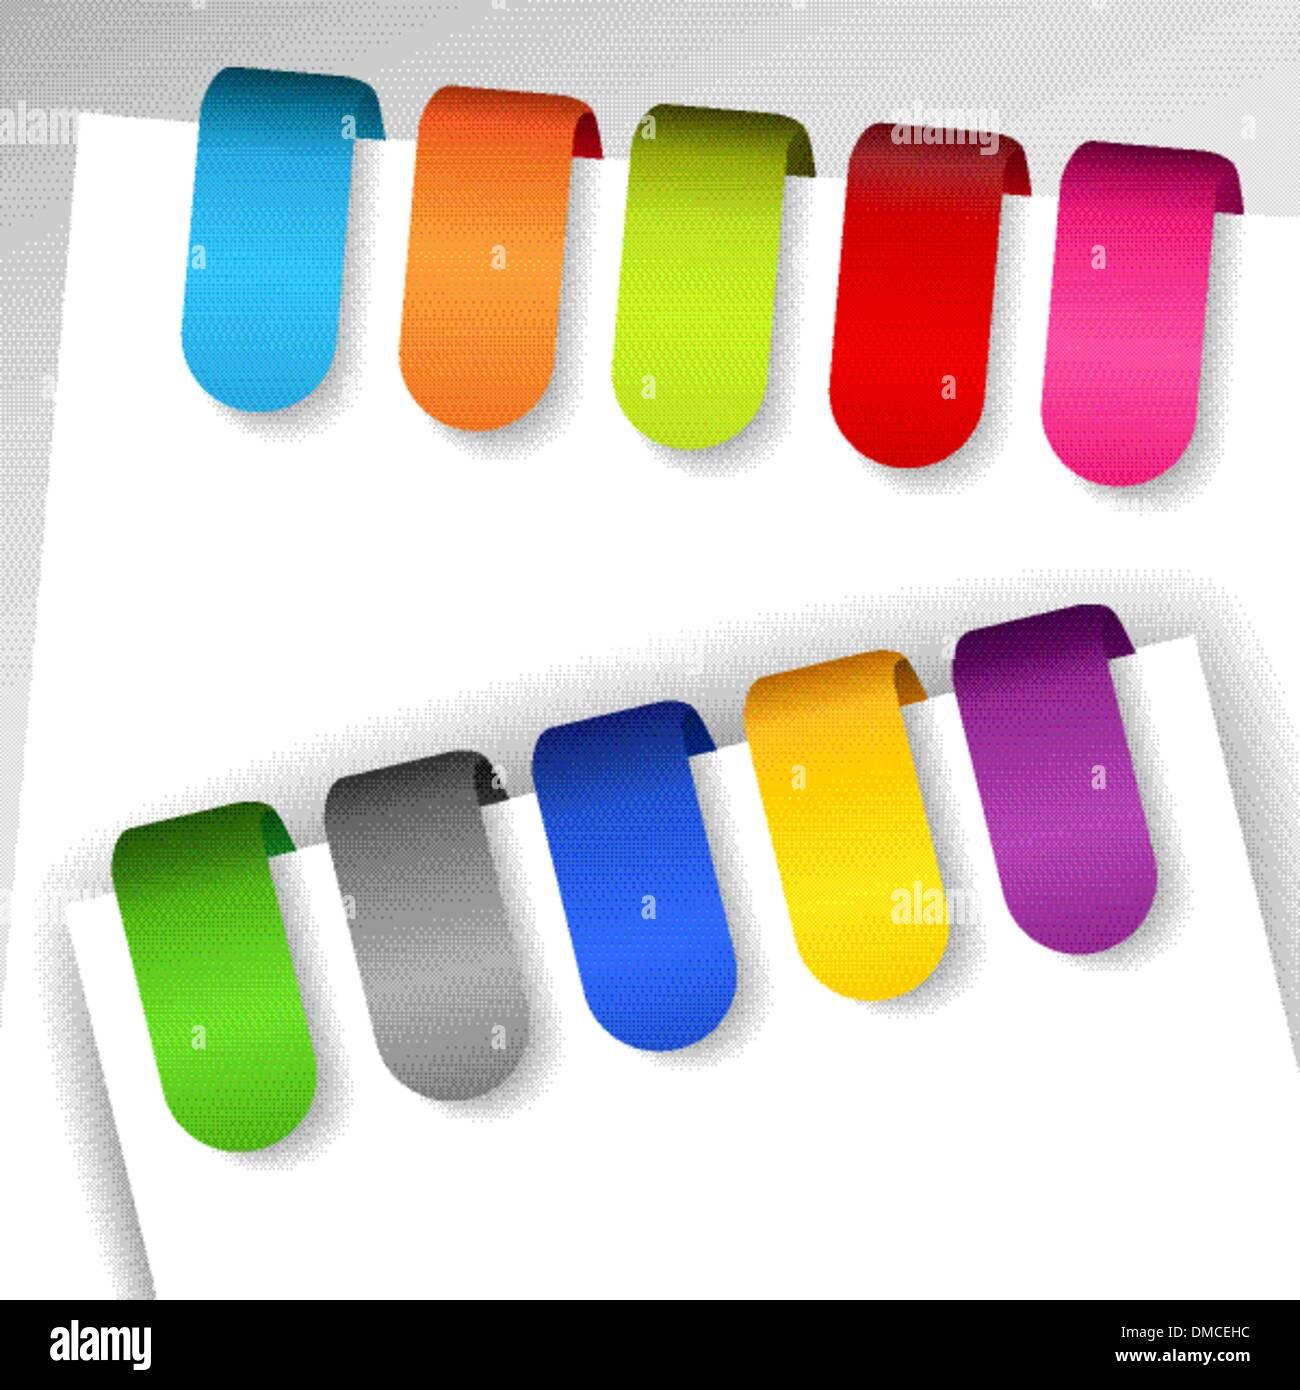 Etiquetas de papel colorido Imagen De Stock